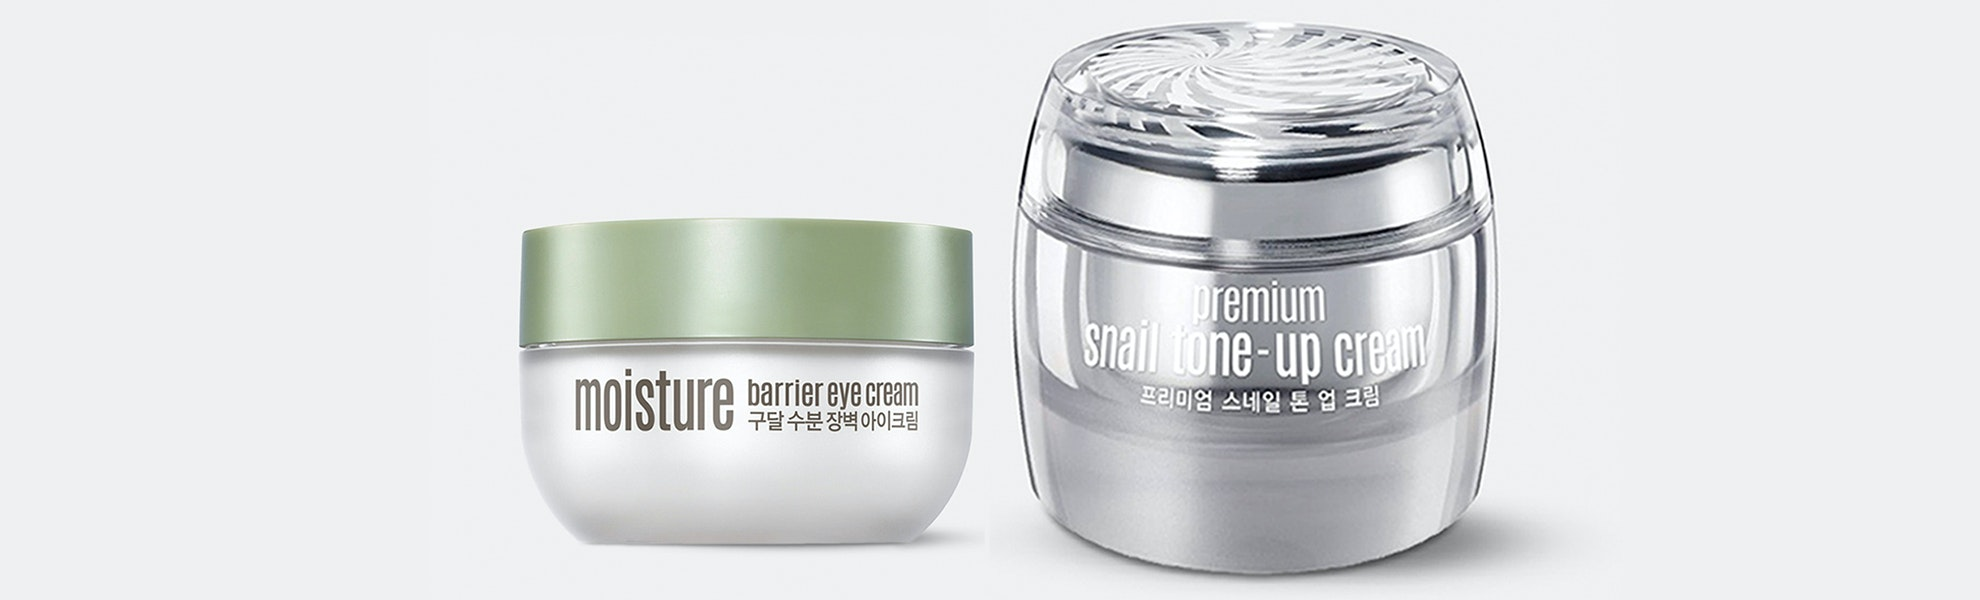 Goodal Premium Snail Tone-Up & Moisture Barrier Set